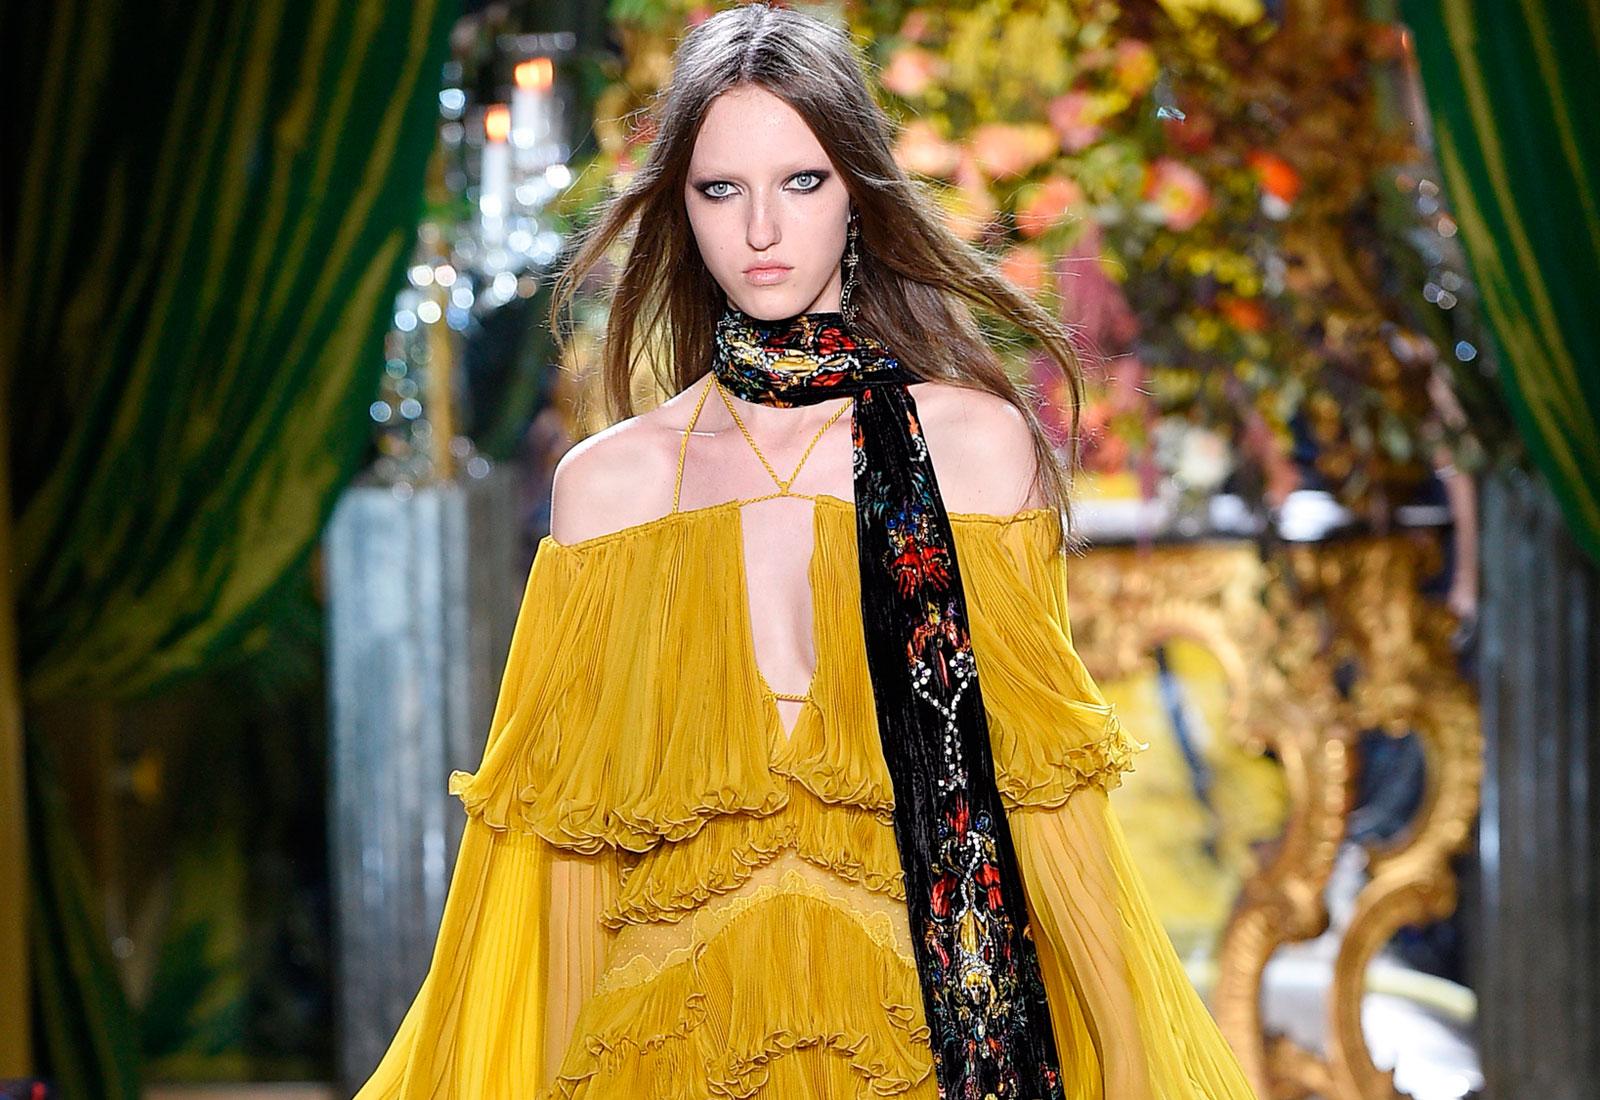 roberto cavalli yellow ruffle dress aw16/17 fashion trends 1600 x 1100